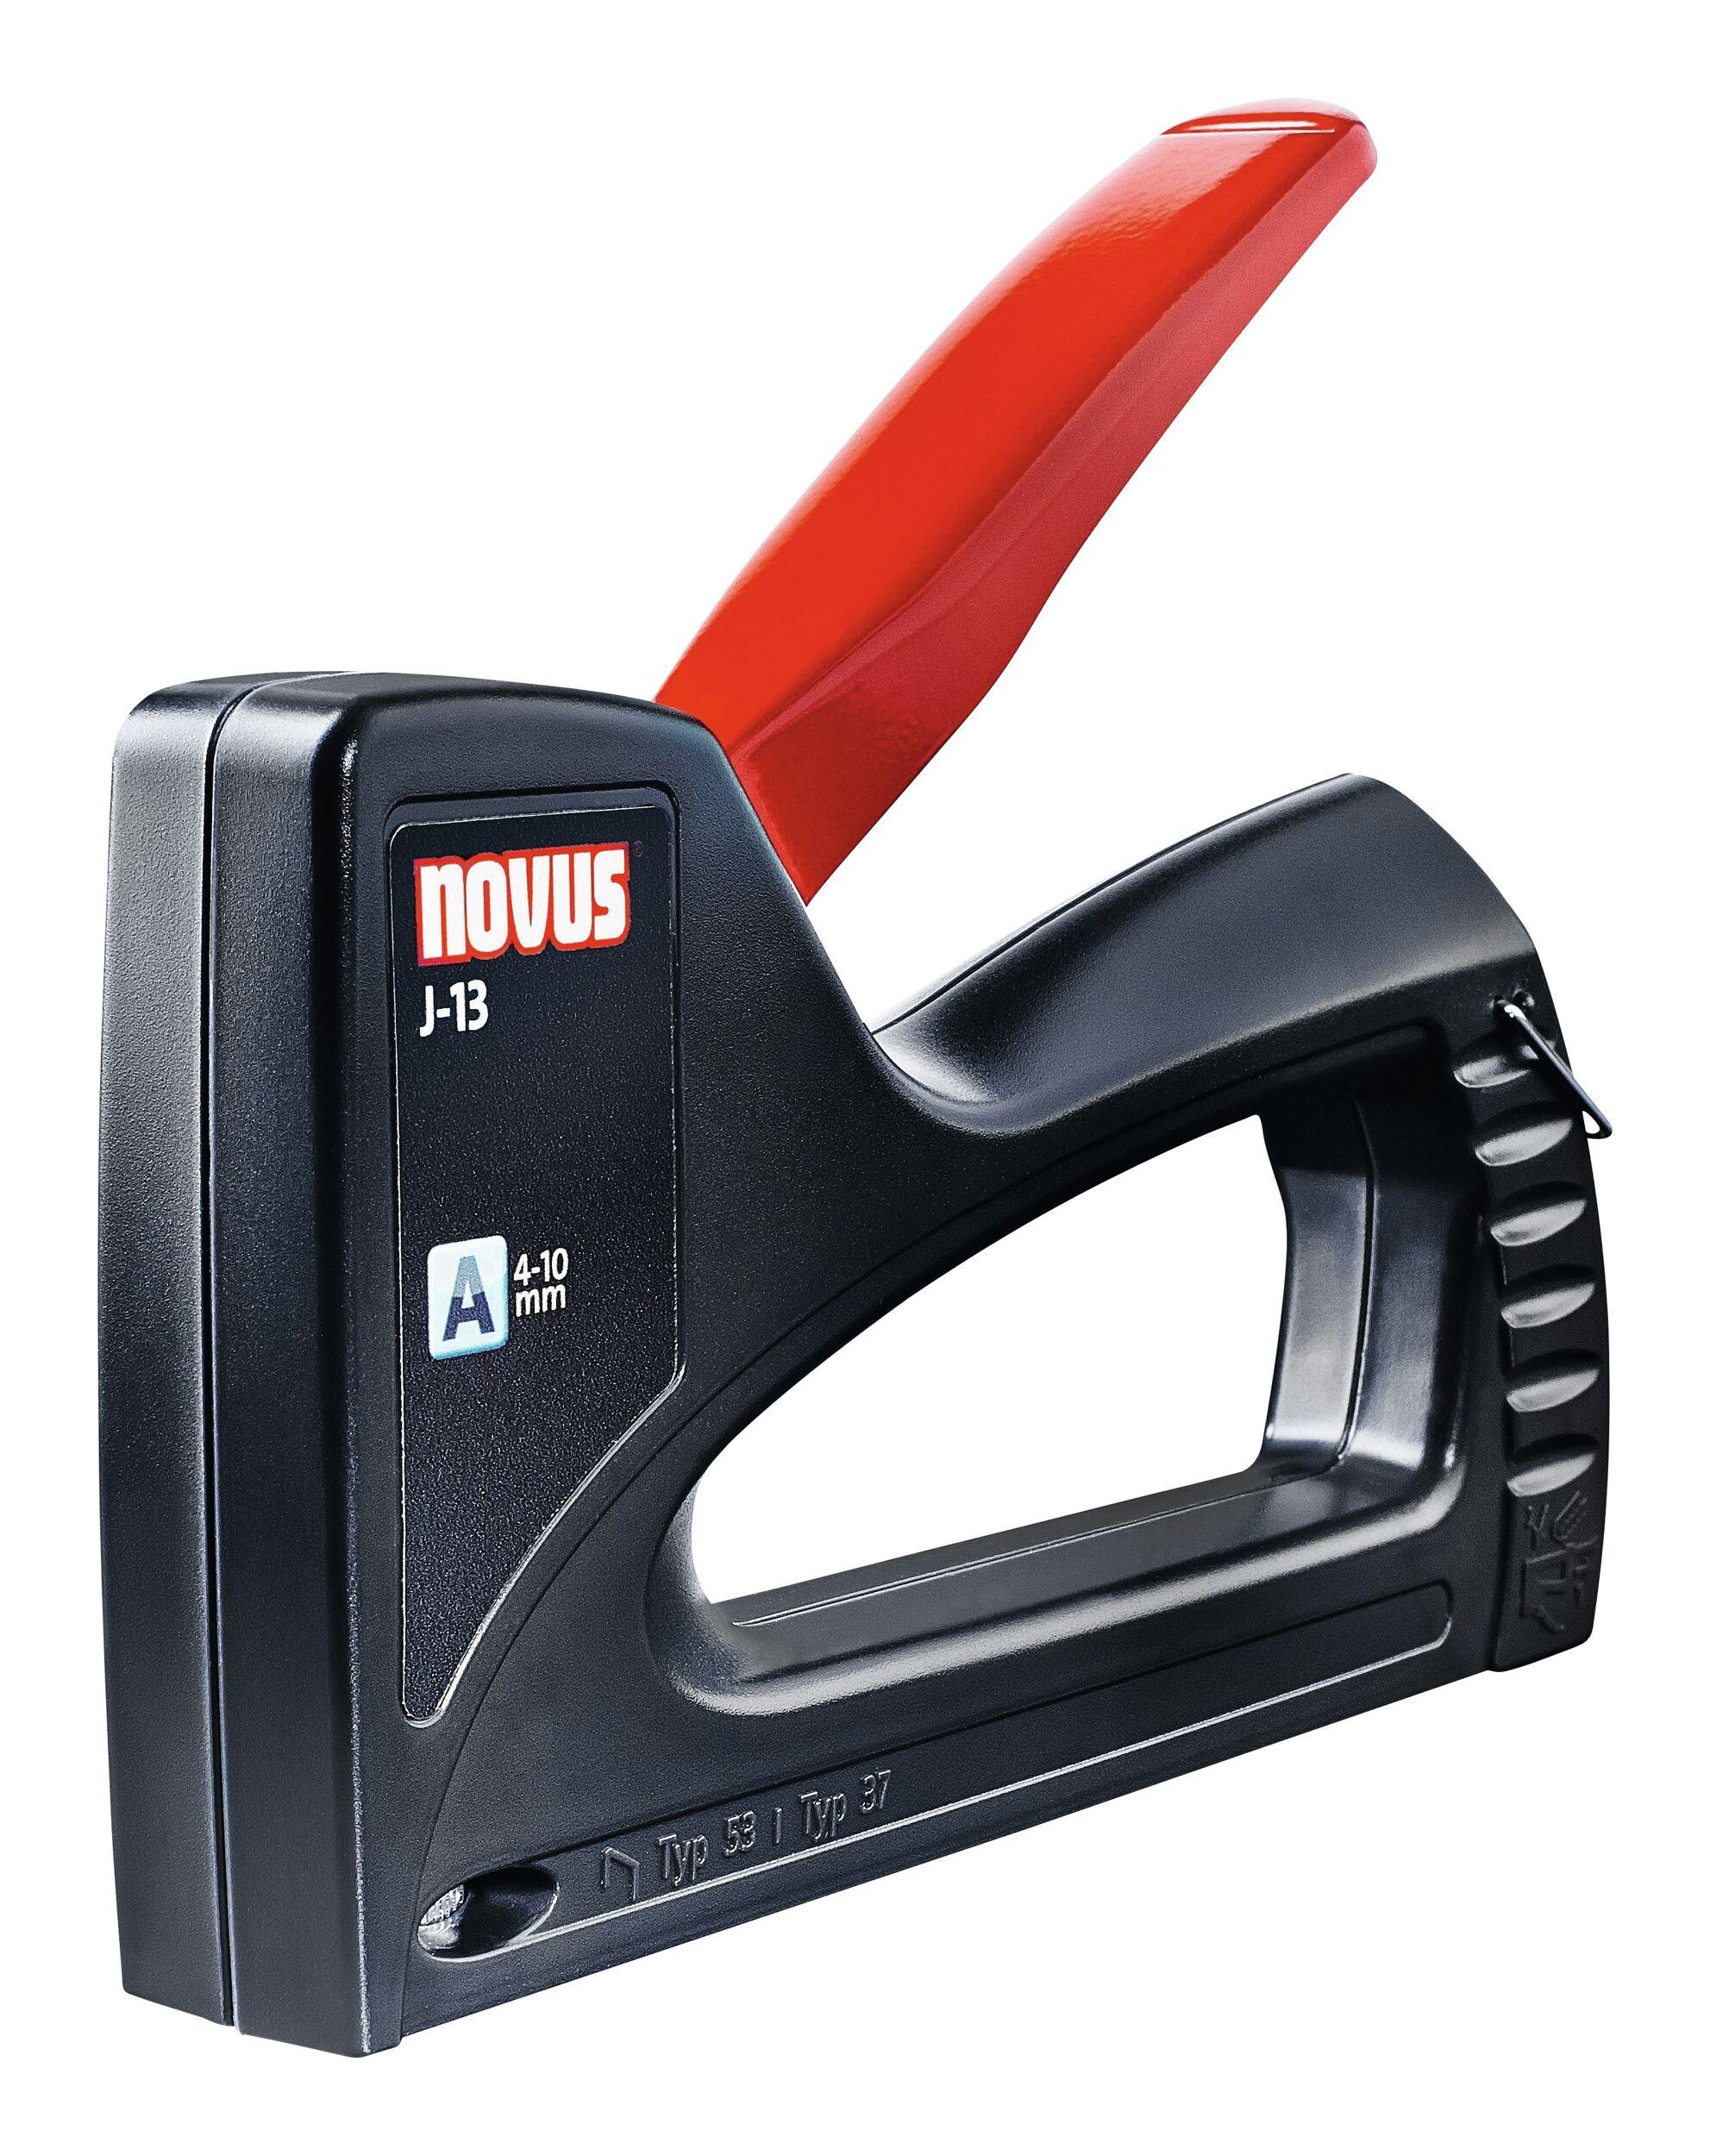 Novus Handtacker J 13 - 030-0435